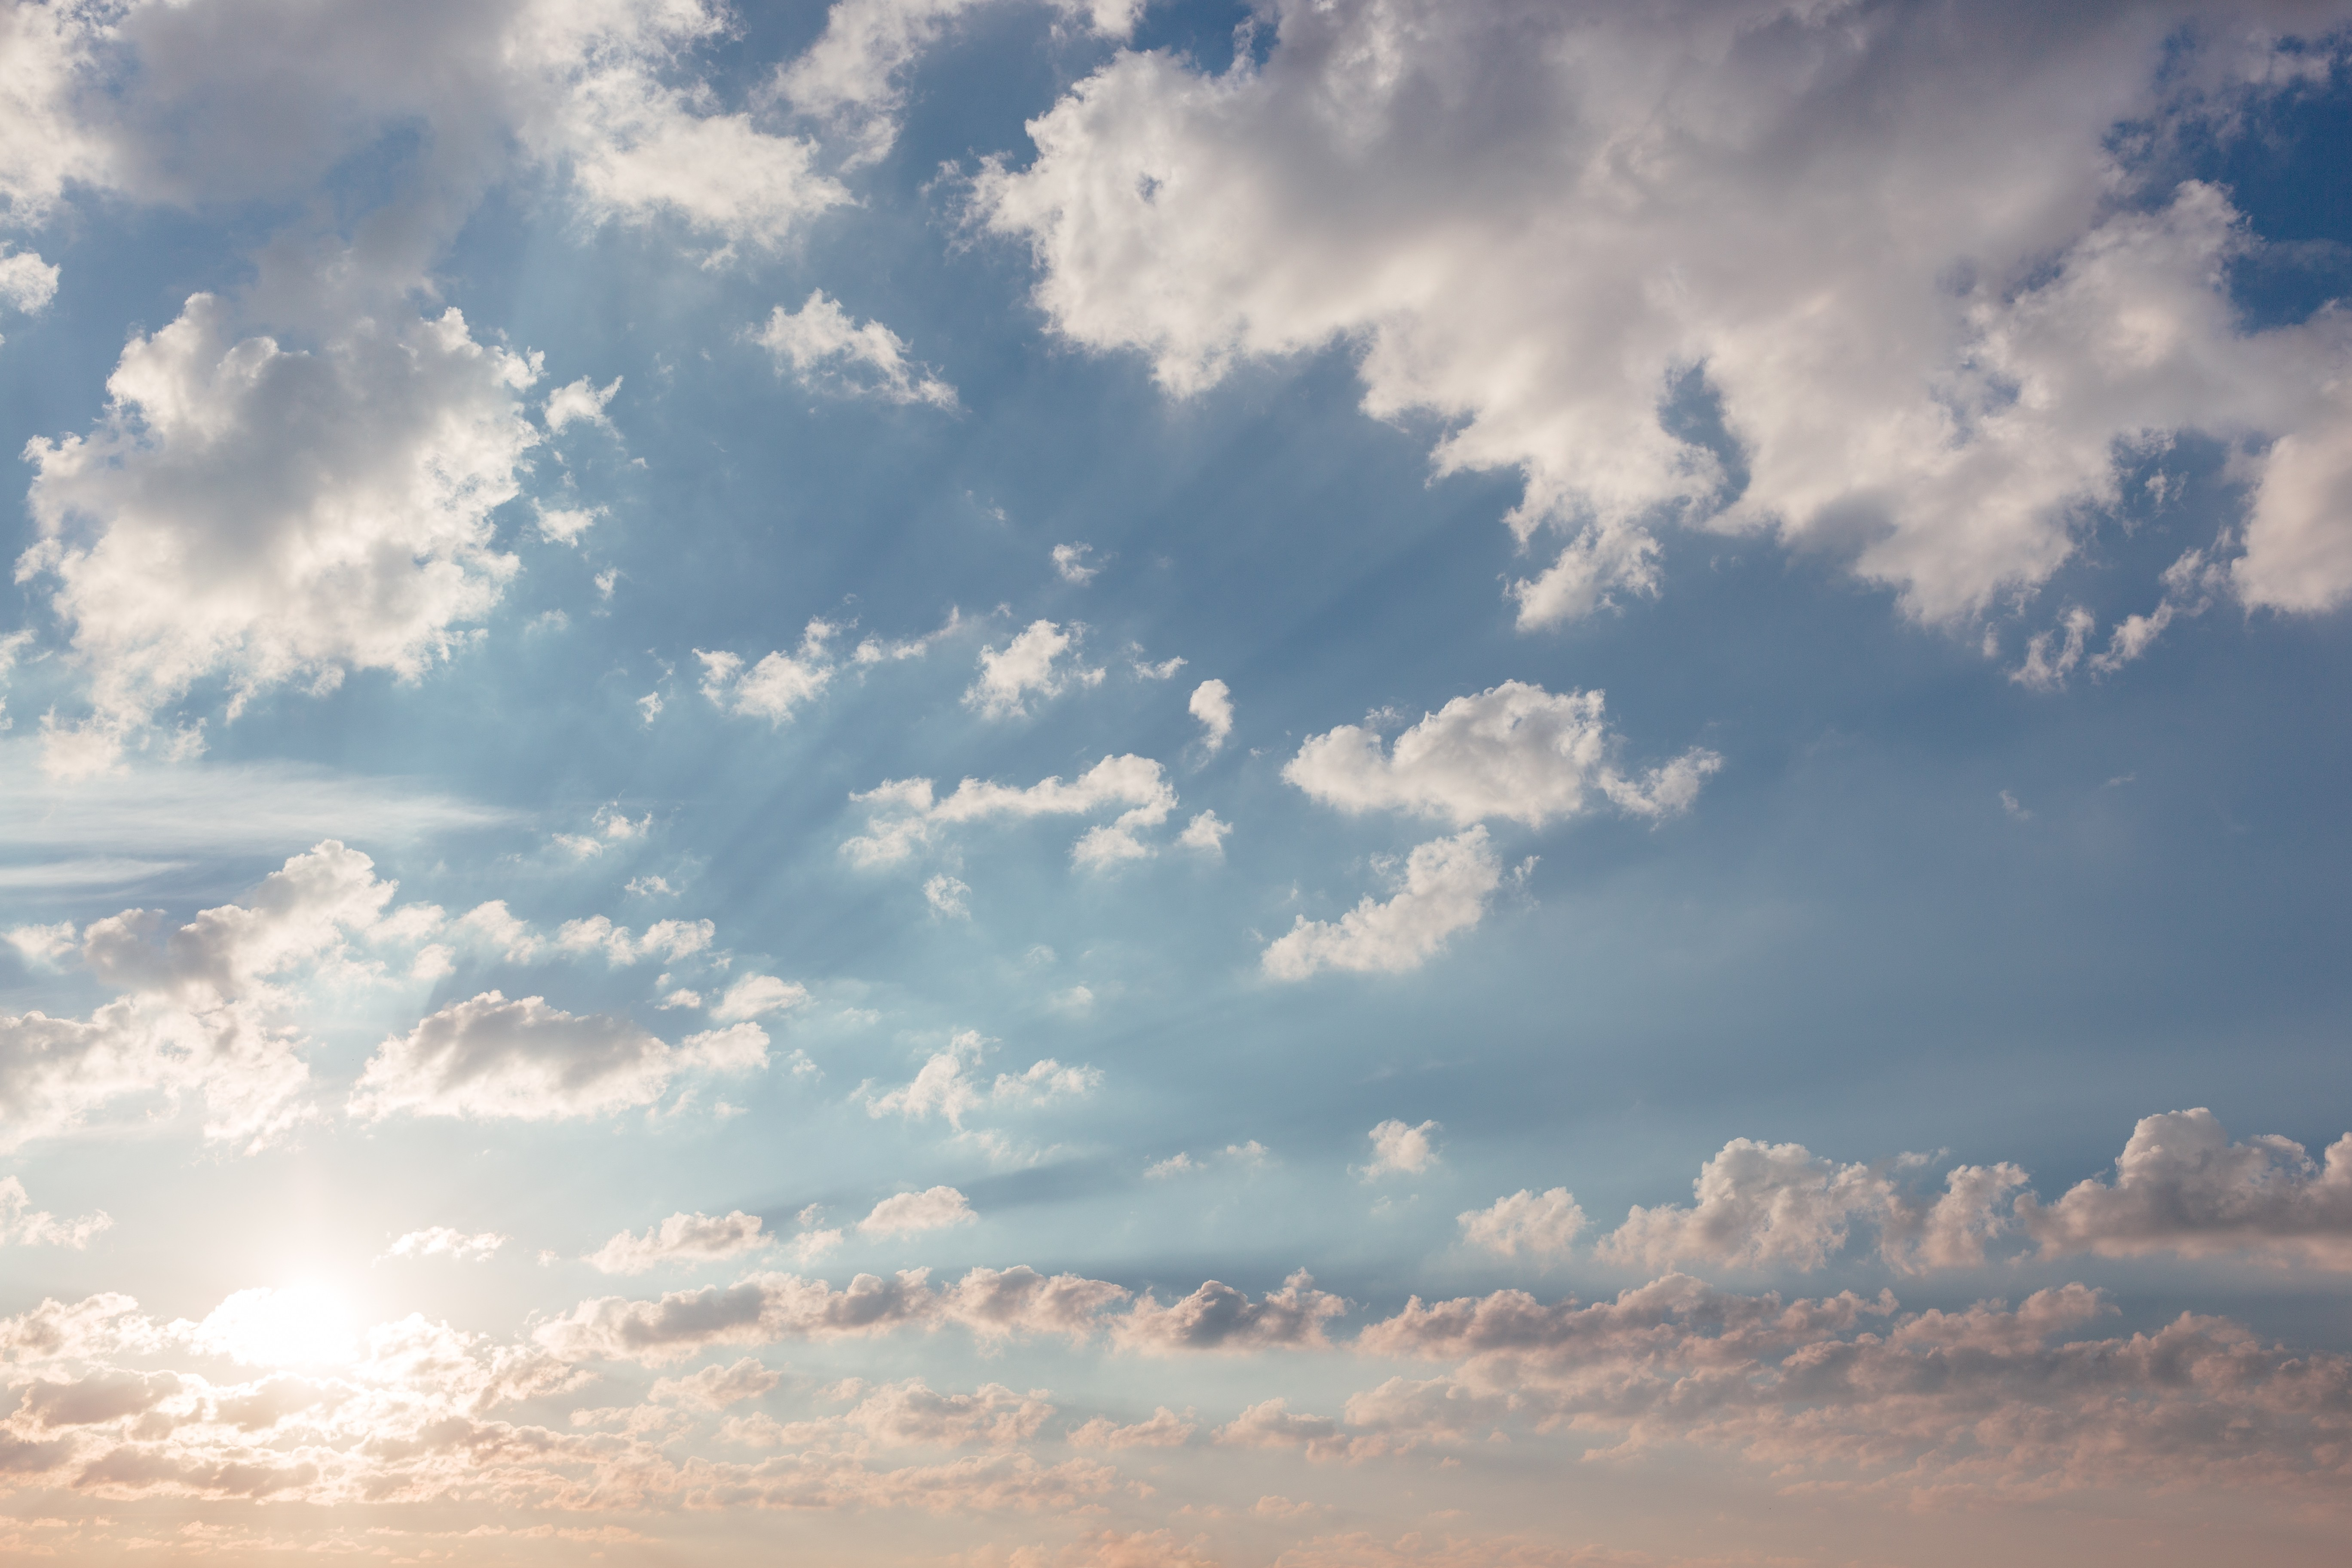 Sky At Sunrise Freestocks Org